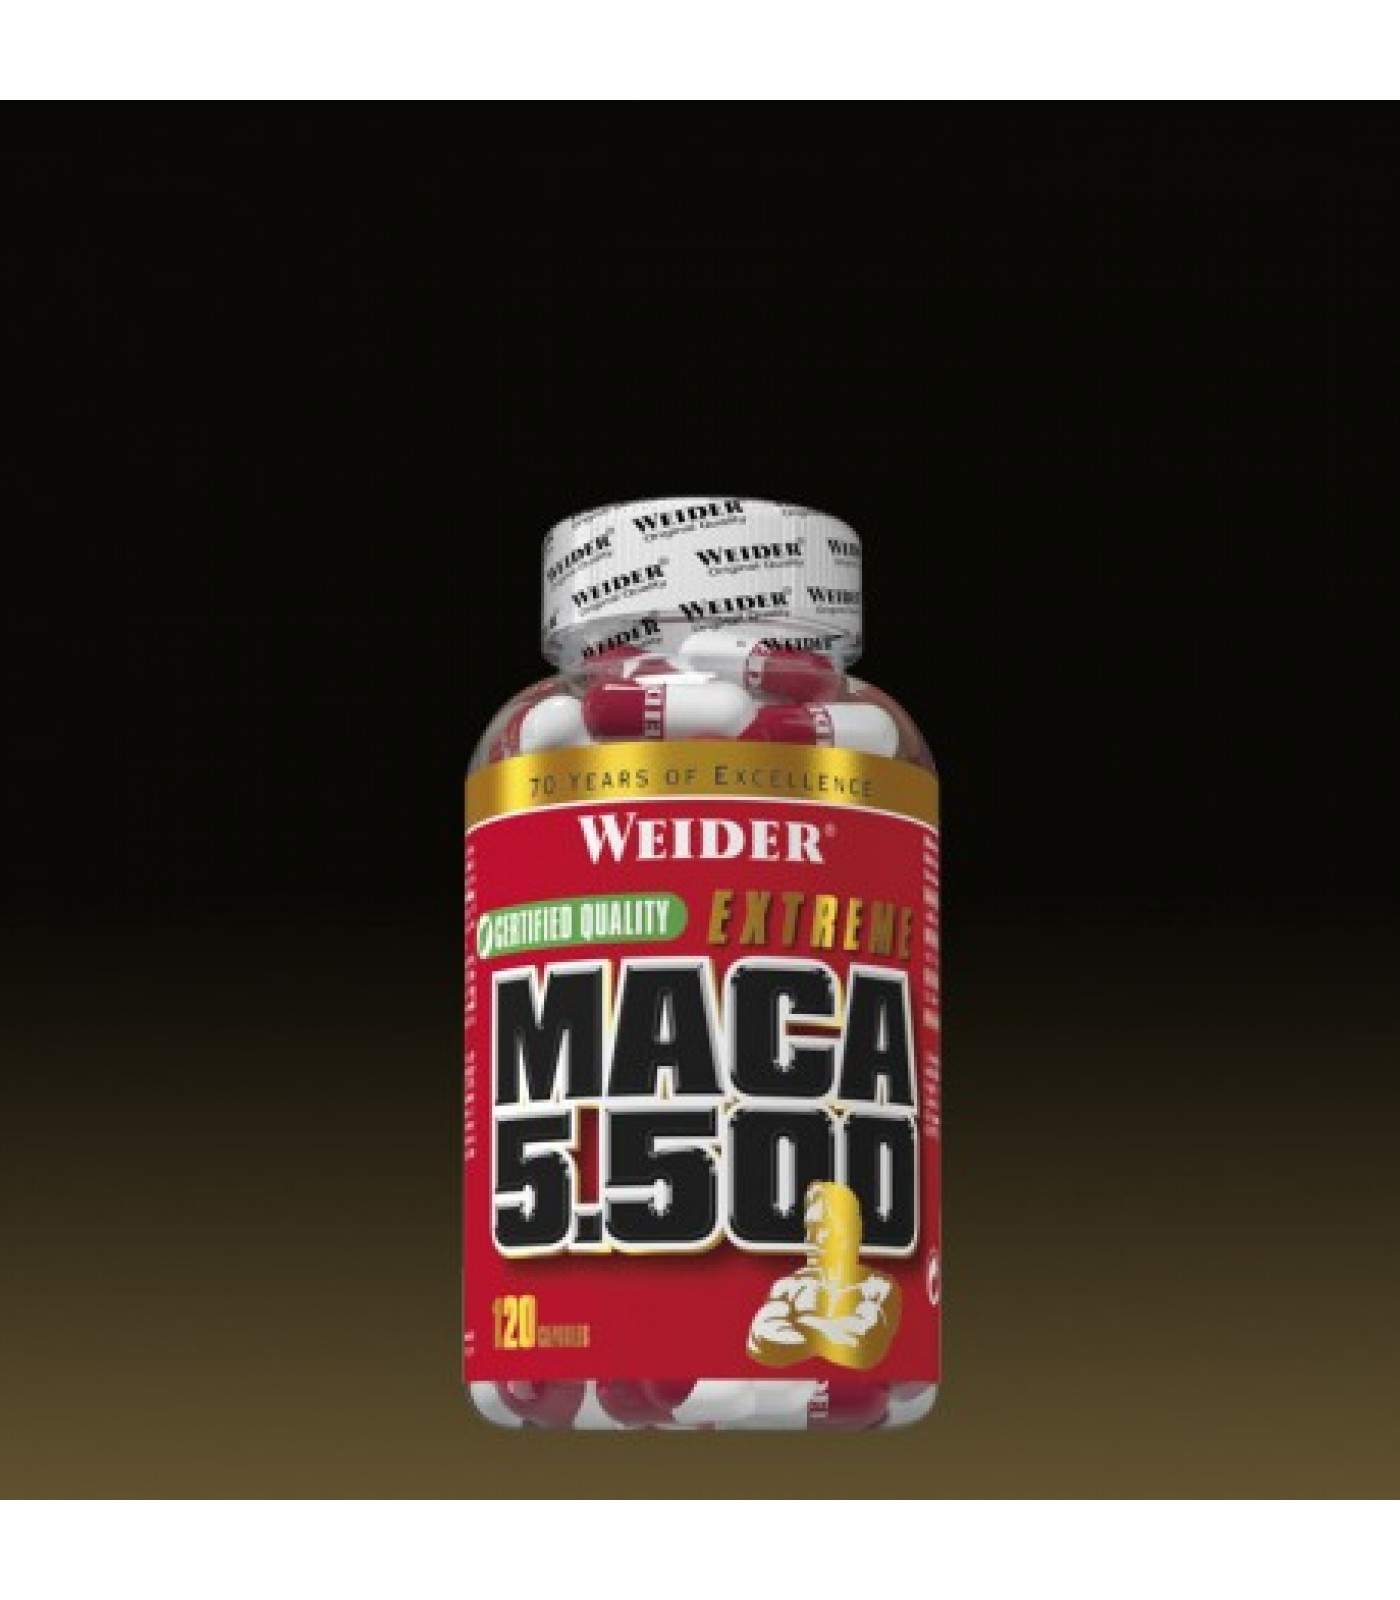 Weider - Maca 5.500 / 120 caps